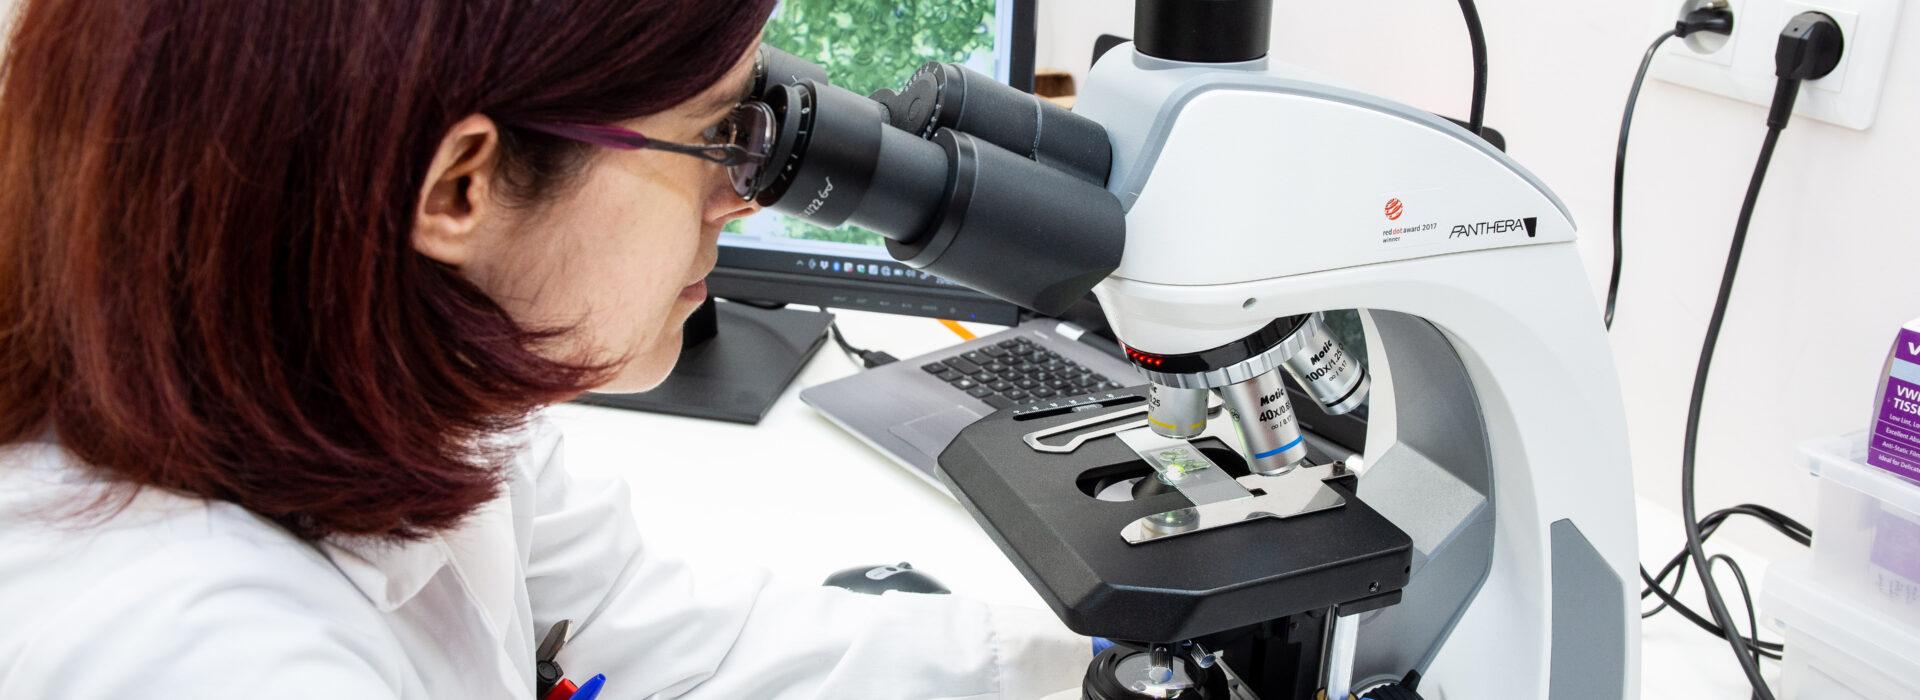 elicitplant science technologie metabolismeplante phytosterols